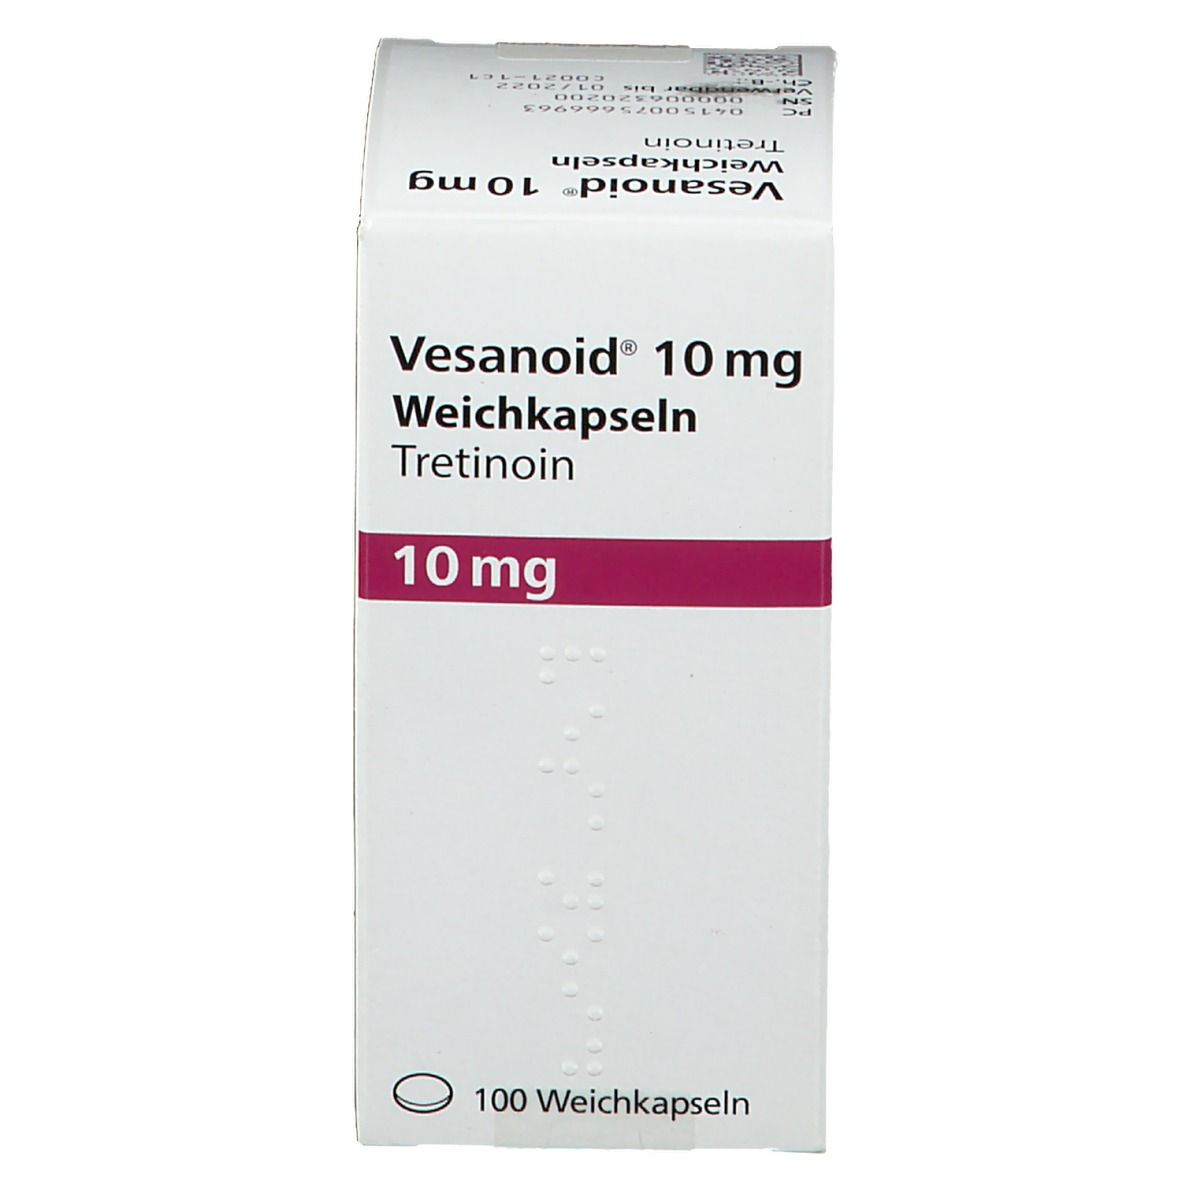 Vesanoid® 10 mg 100 St - shop-apotheke.com